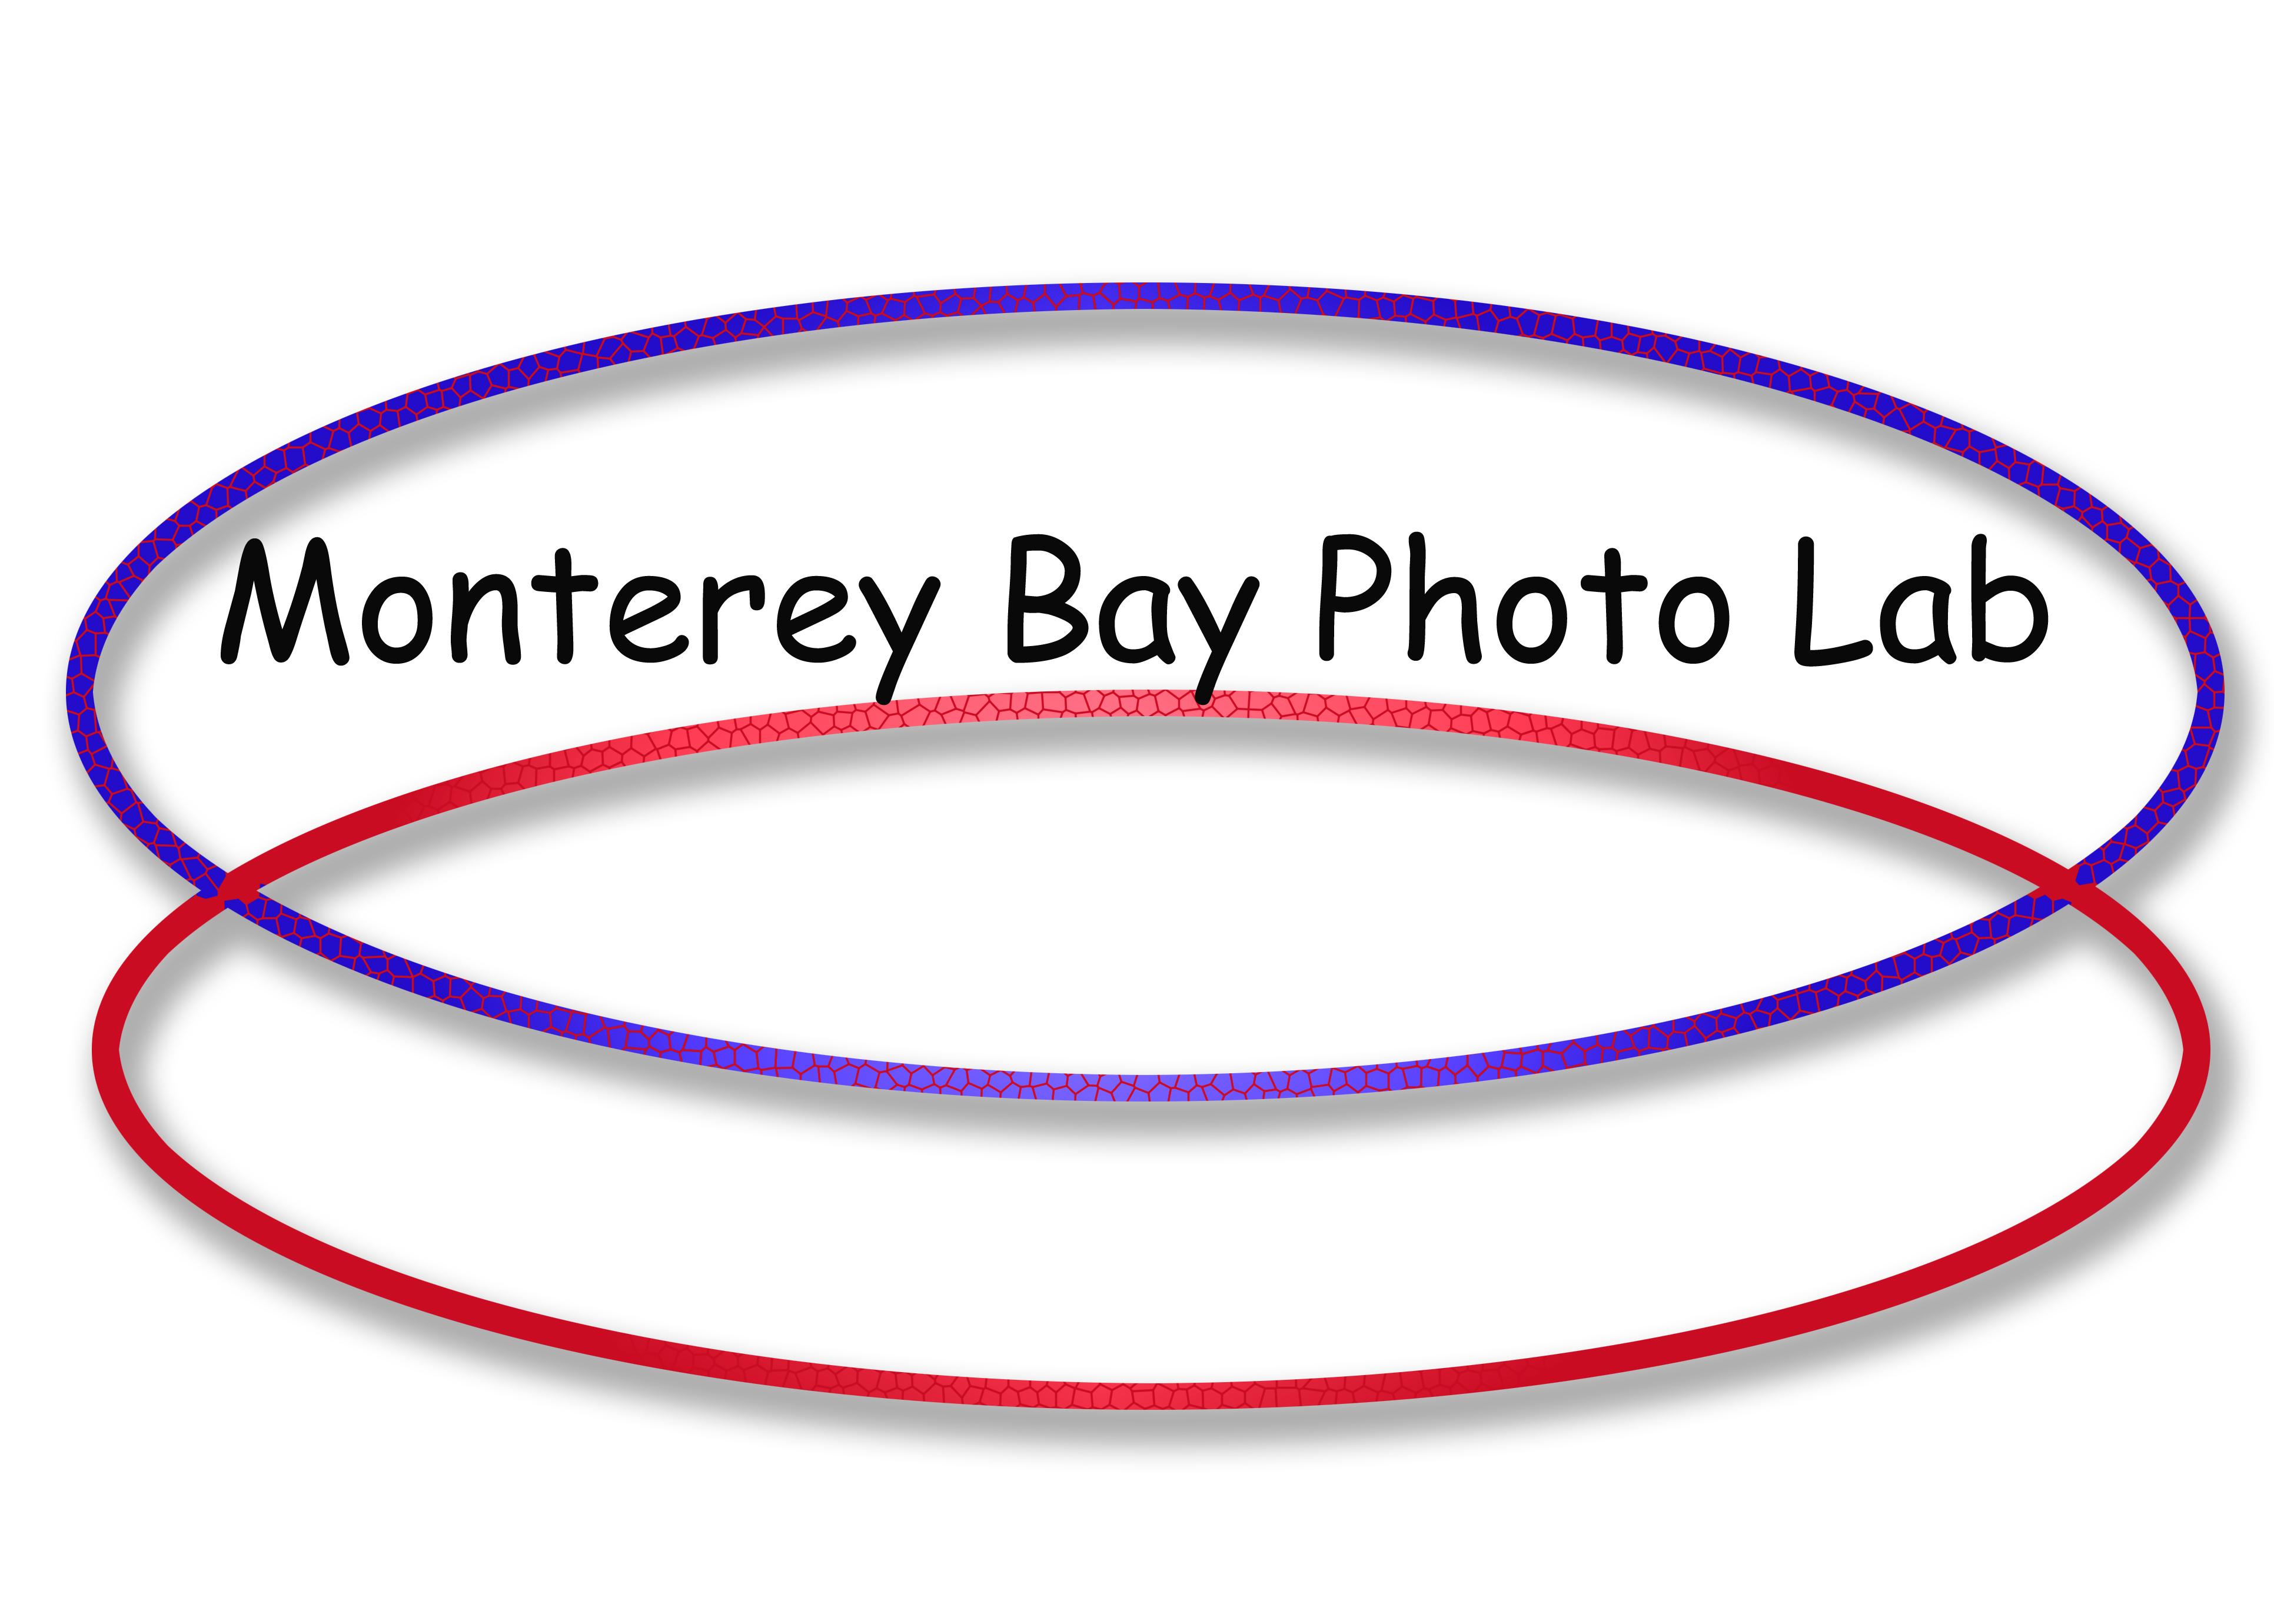 Monterey Bay Photo Lab